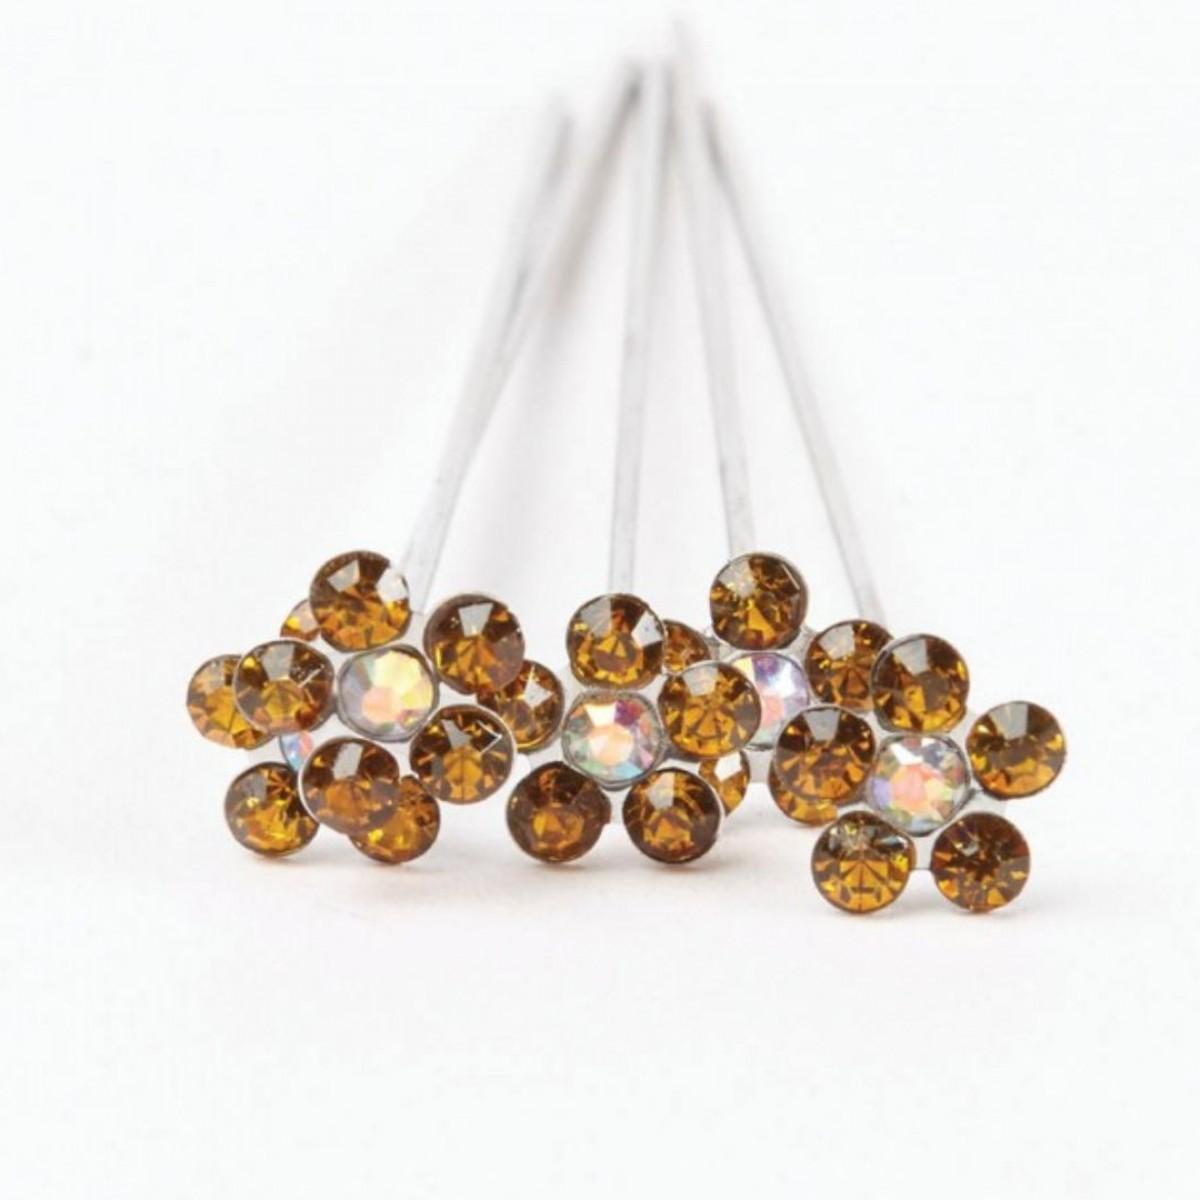 Karas Kisses Pixie Brown Gold 10mmx8cm 5 Pins